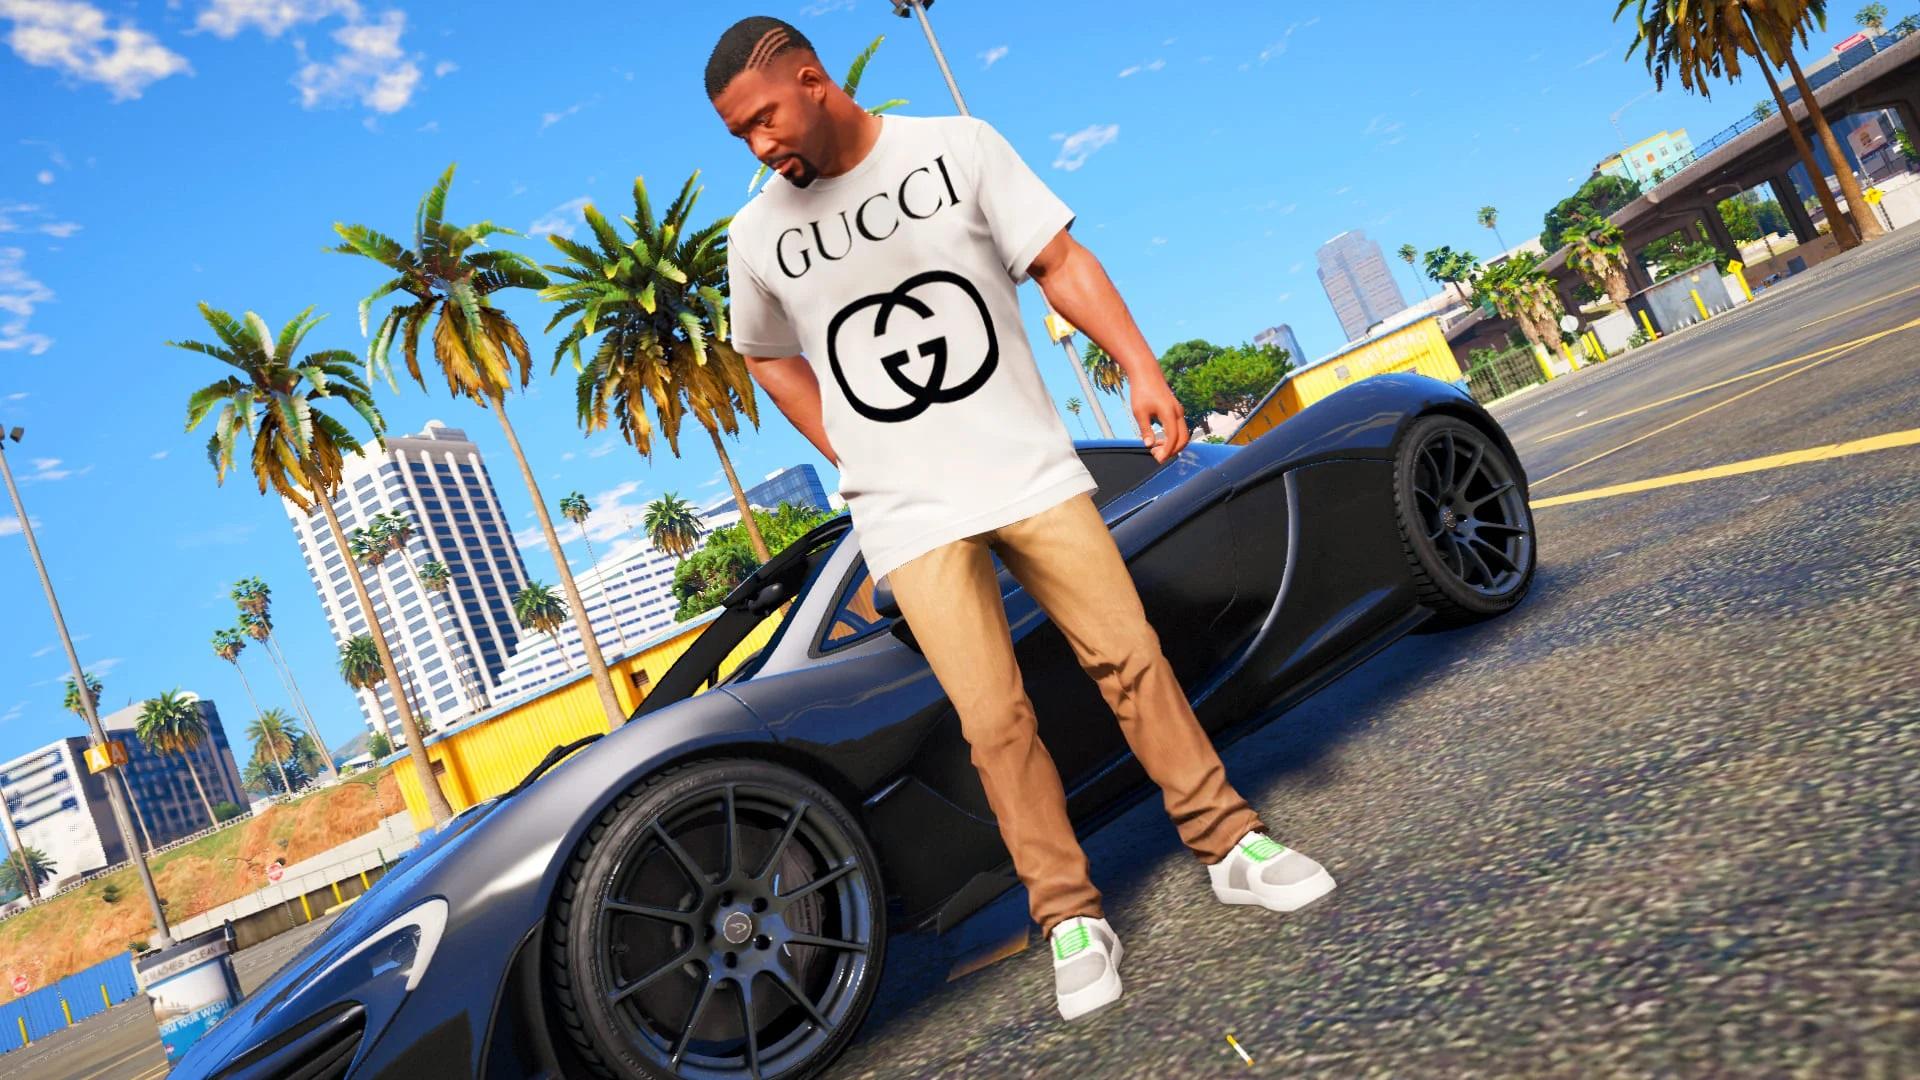 Gucci Interlocking GG Logo Tee (Remastered) 2.0